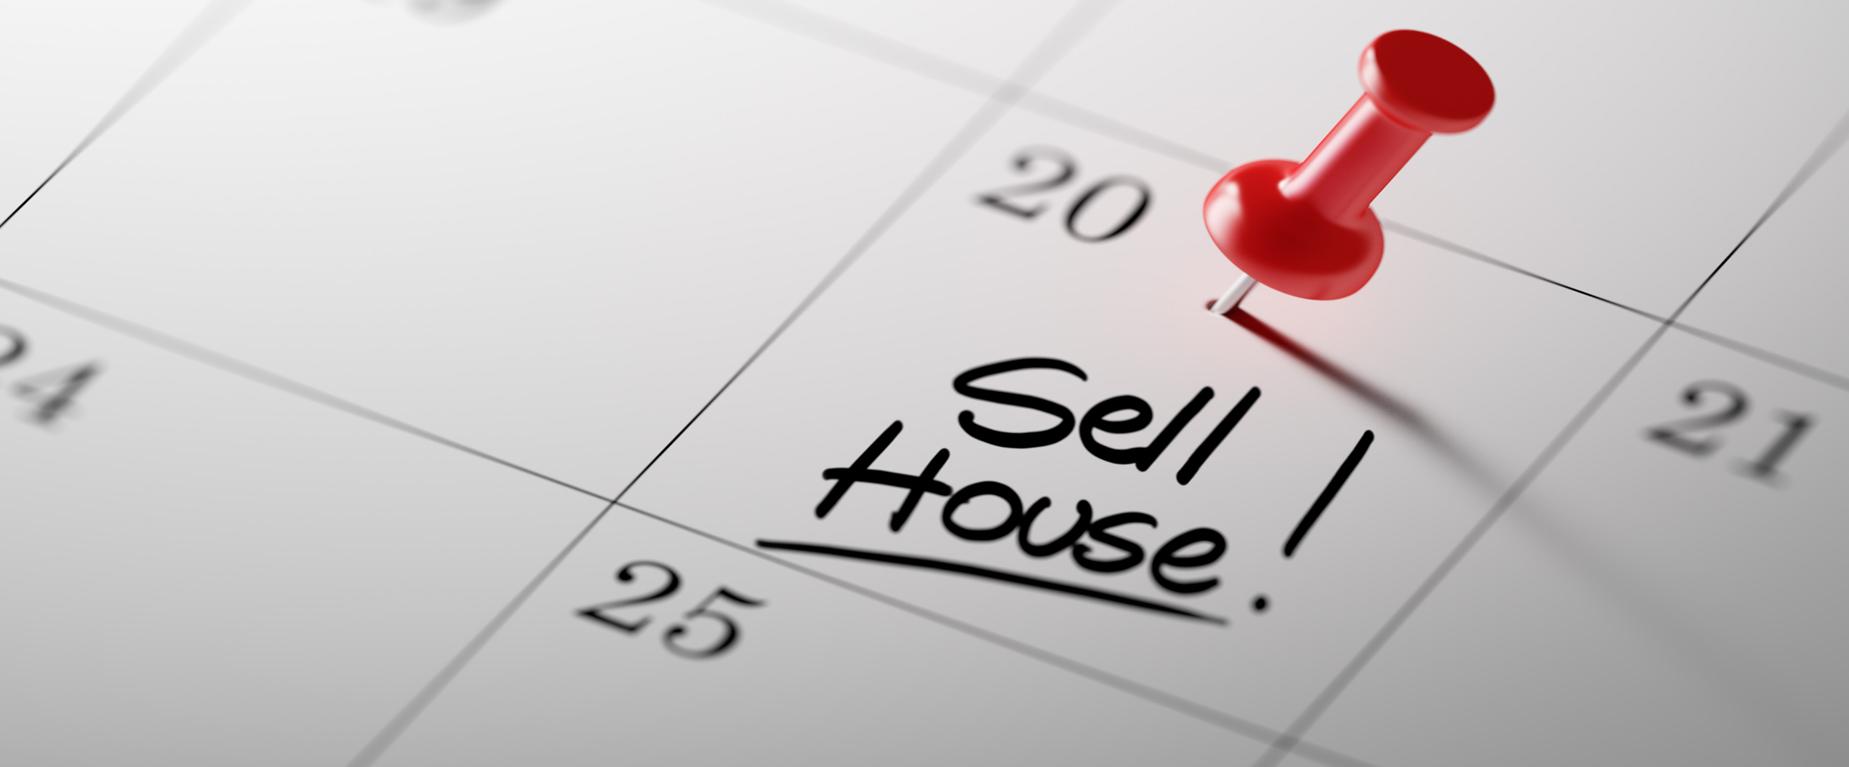 Why Should Buy Properties in La Nucia